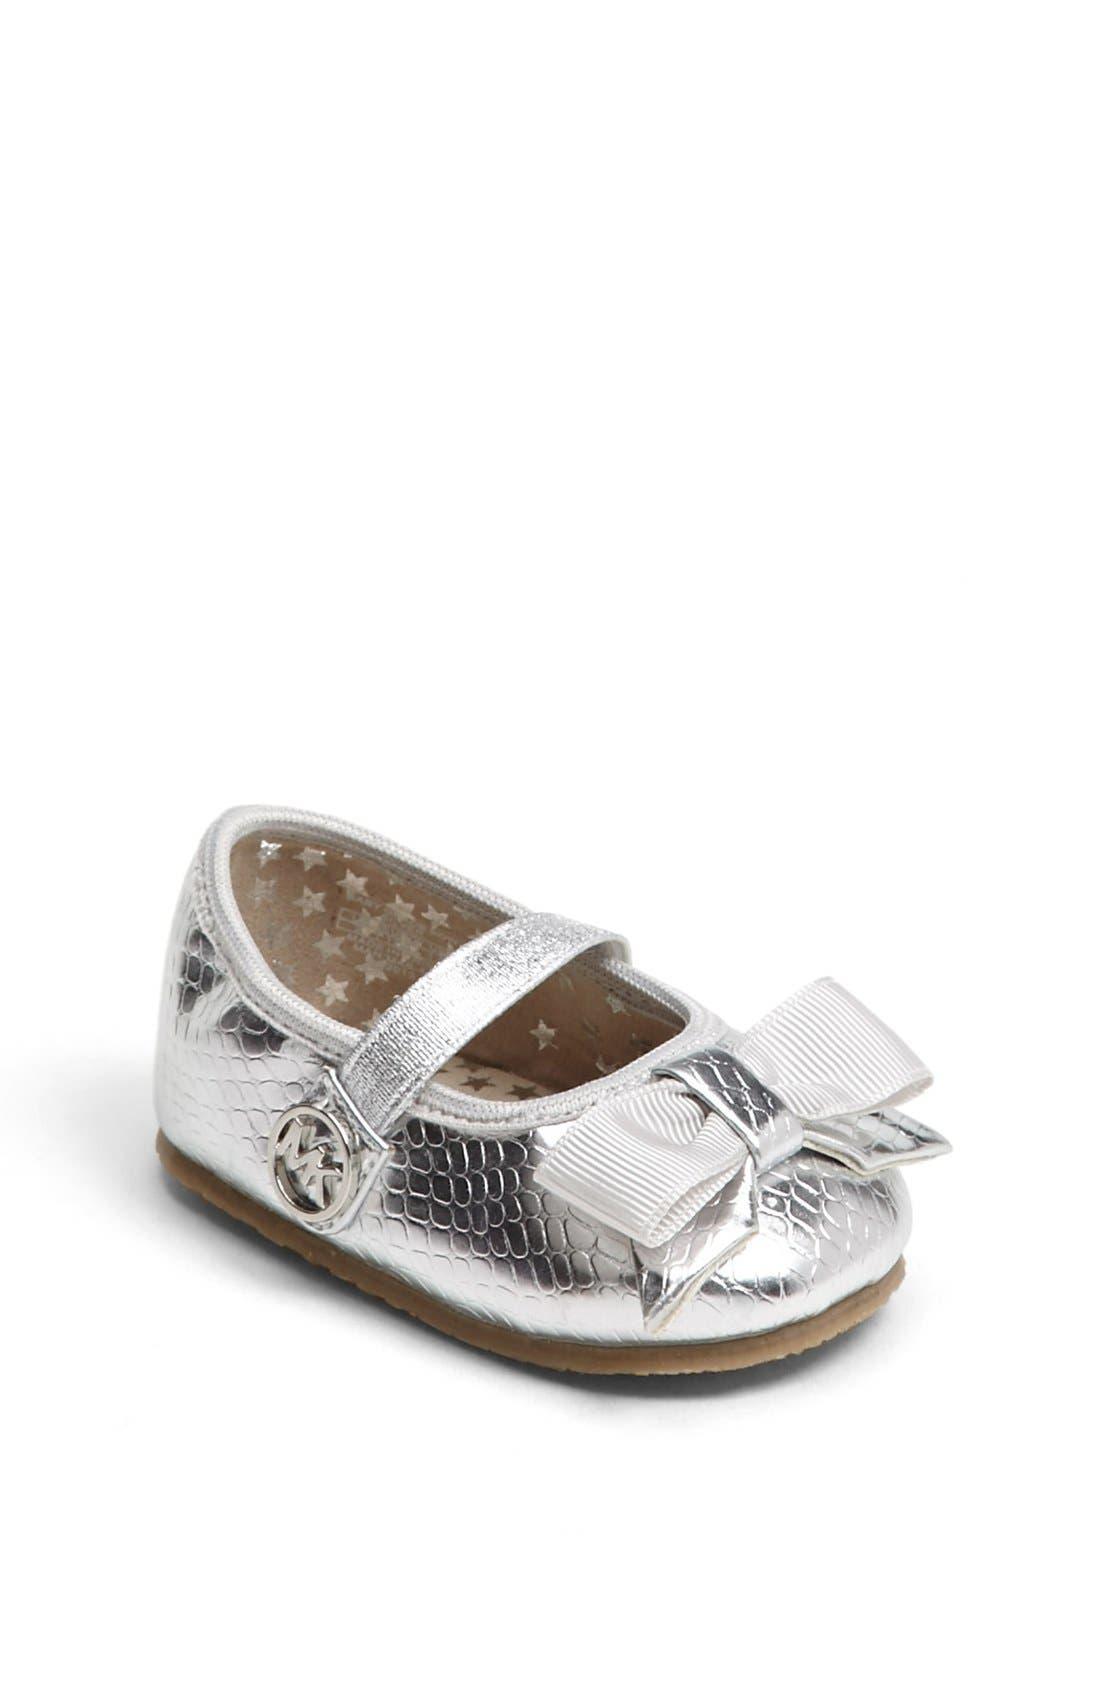 Main Image - MICHAEL Michael Kors 'Grace' Crib Shoe (Baby)